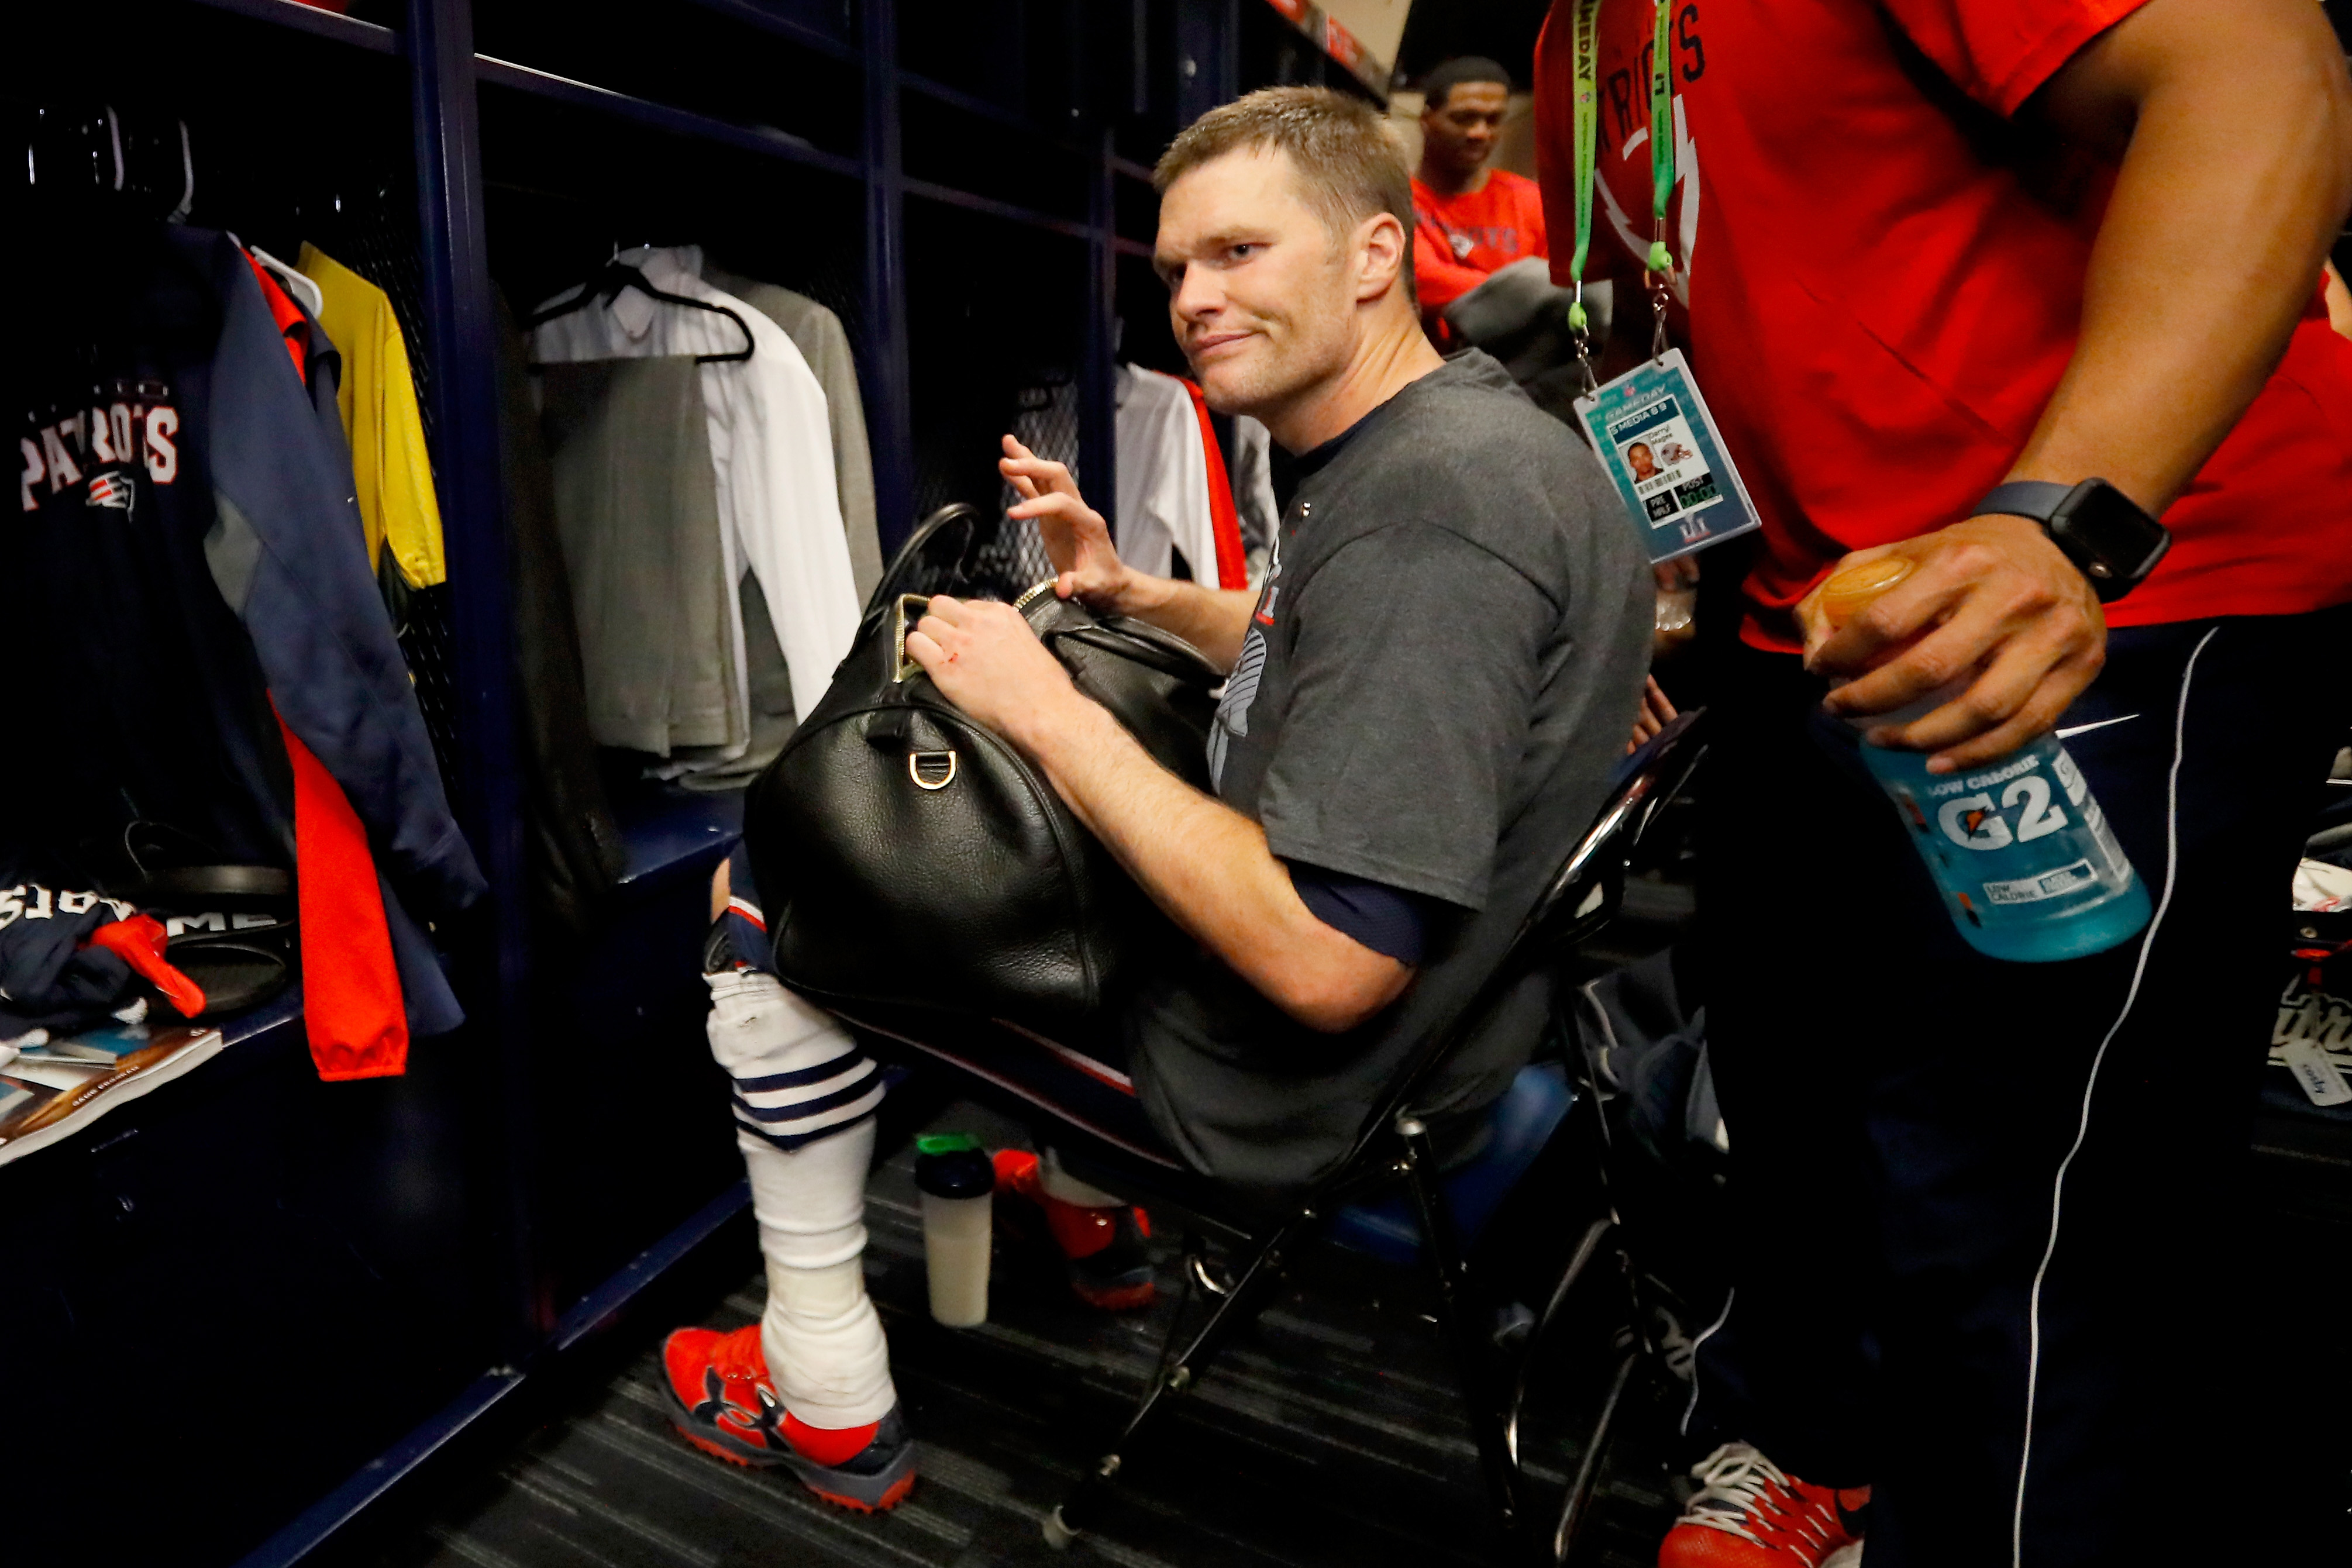 Tom Brady's Super Bowl jersey found by NFL, FBI   kare11.com